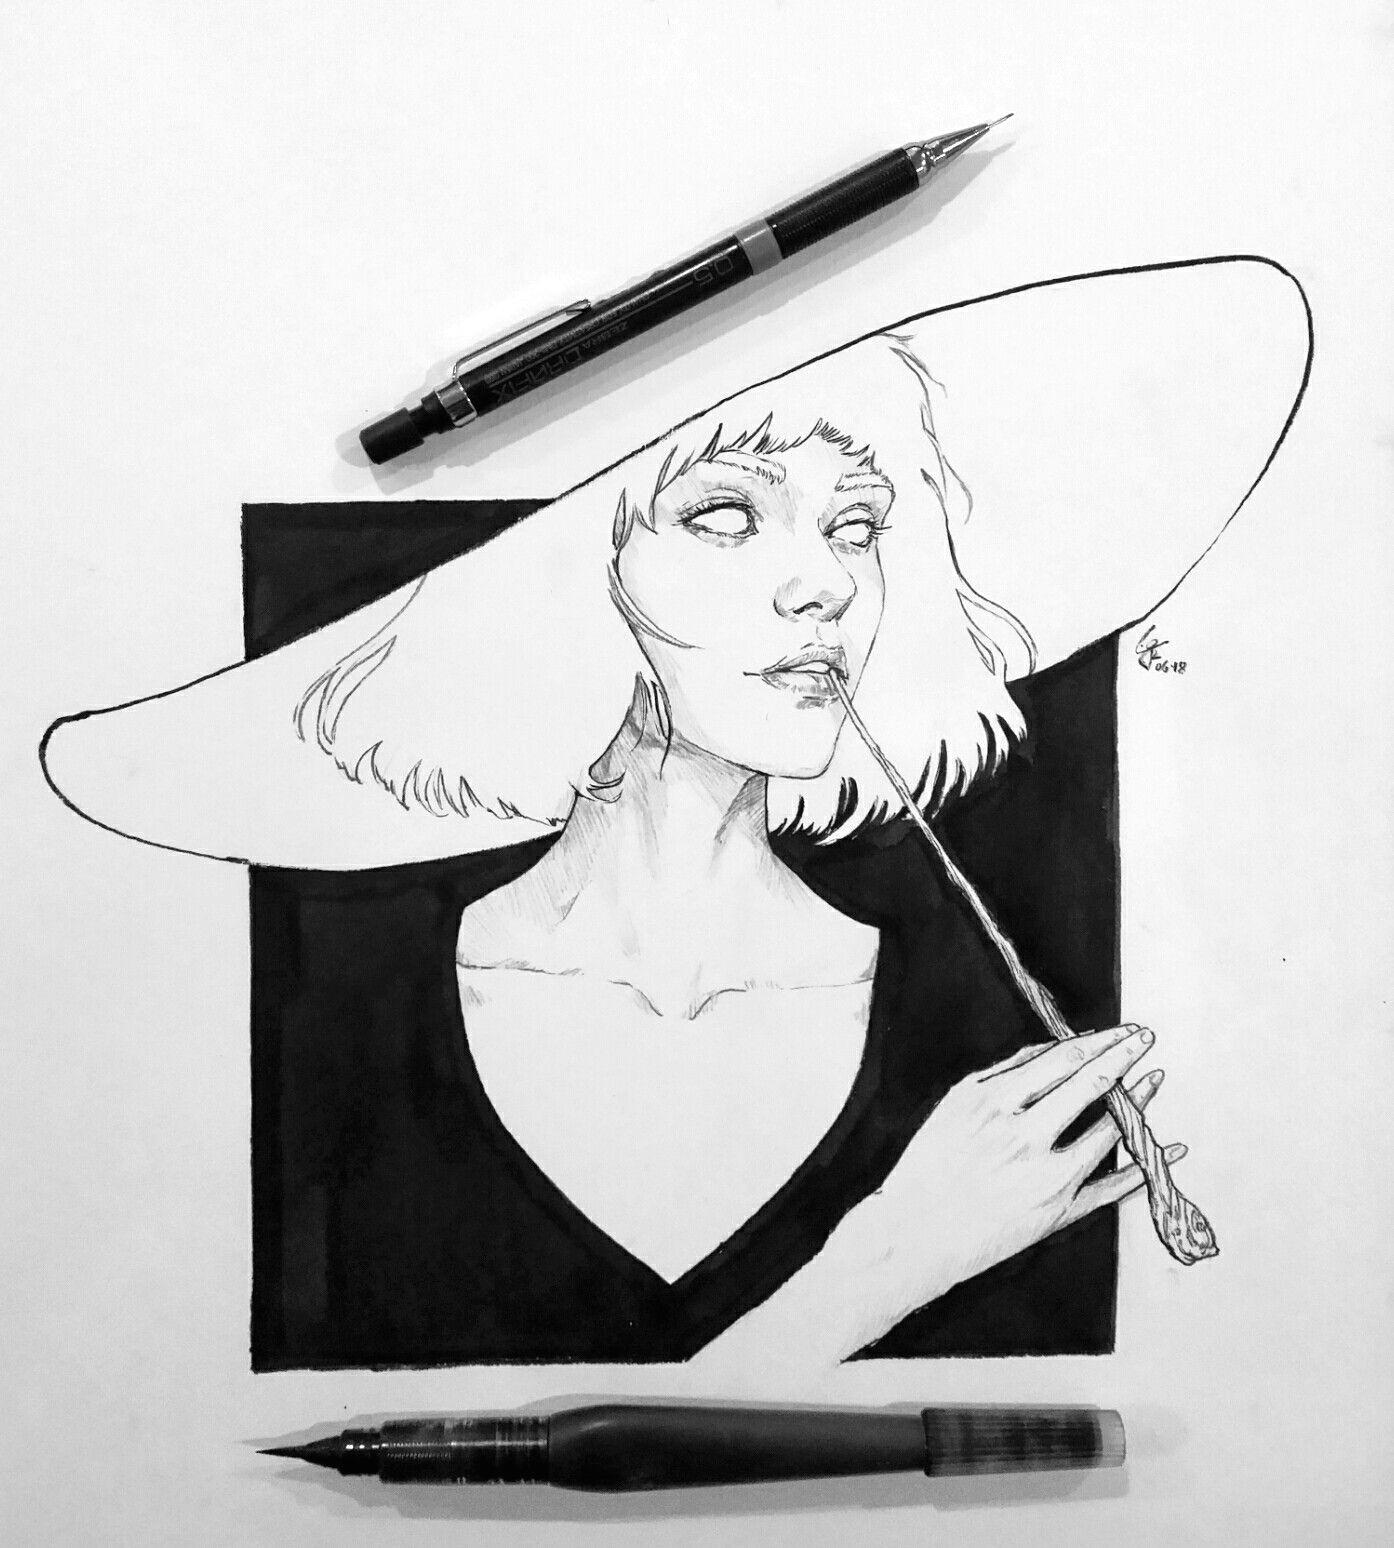 wizard 2018170 art design drawing sketch practice dailysketch